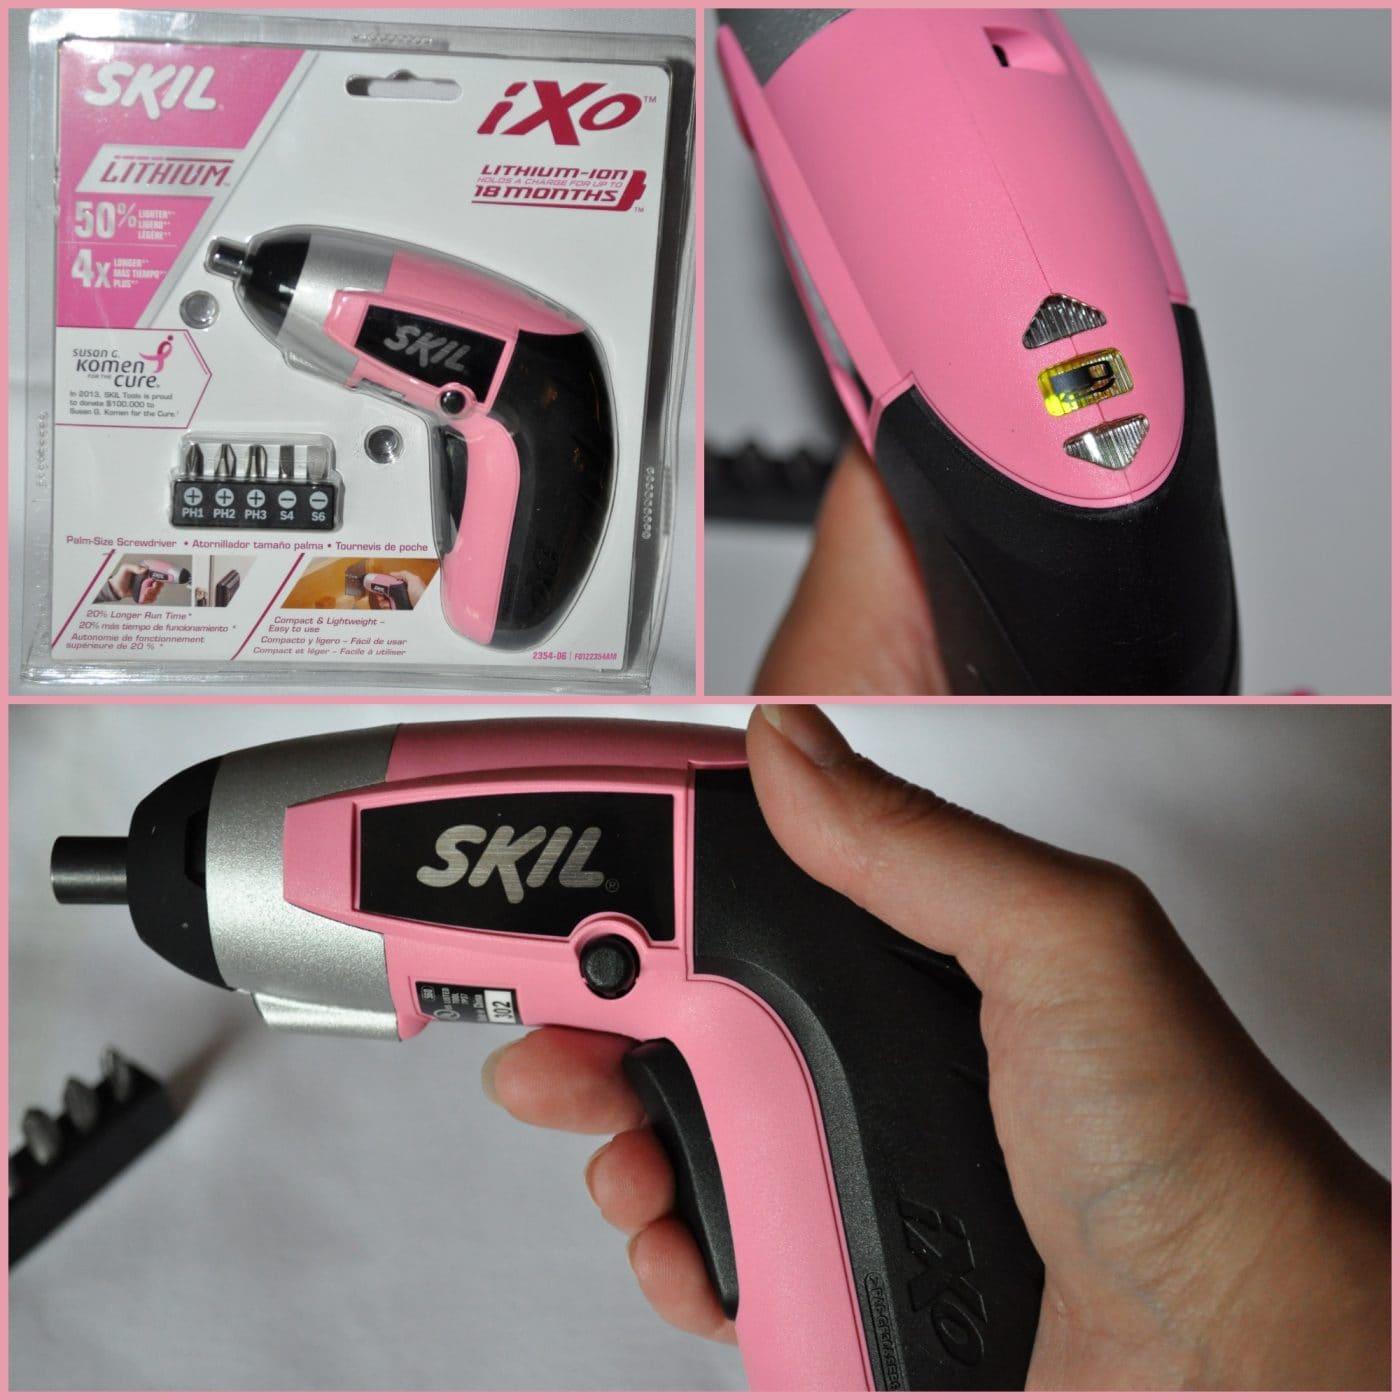 SKIL iXO Pink Review: Palm-Sized Screwdriver